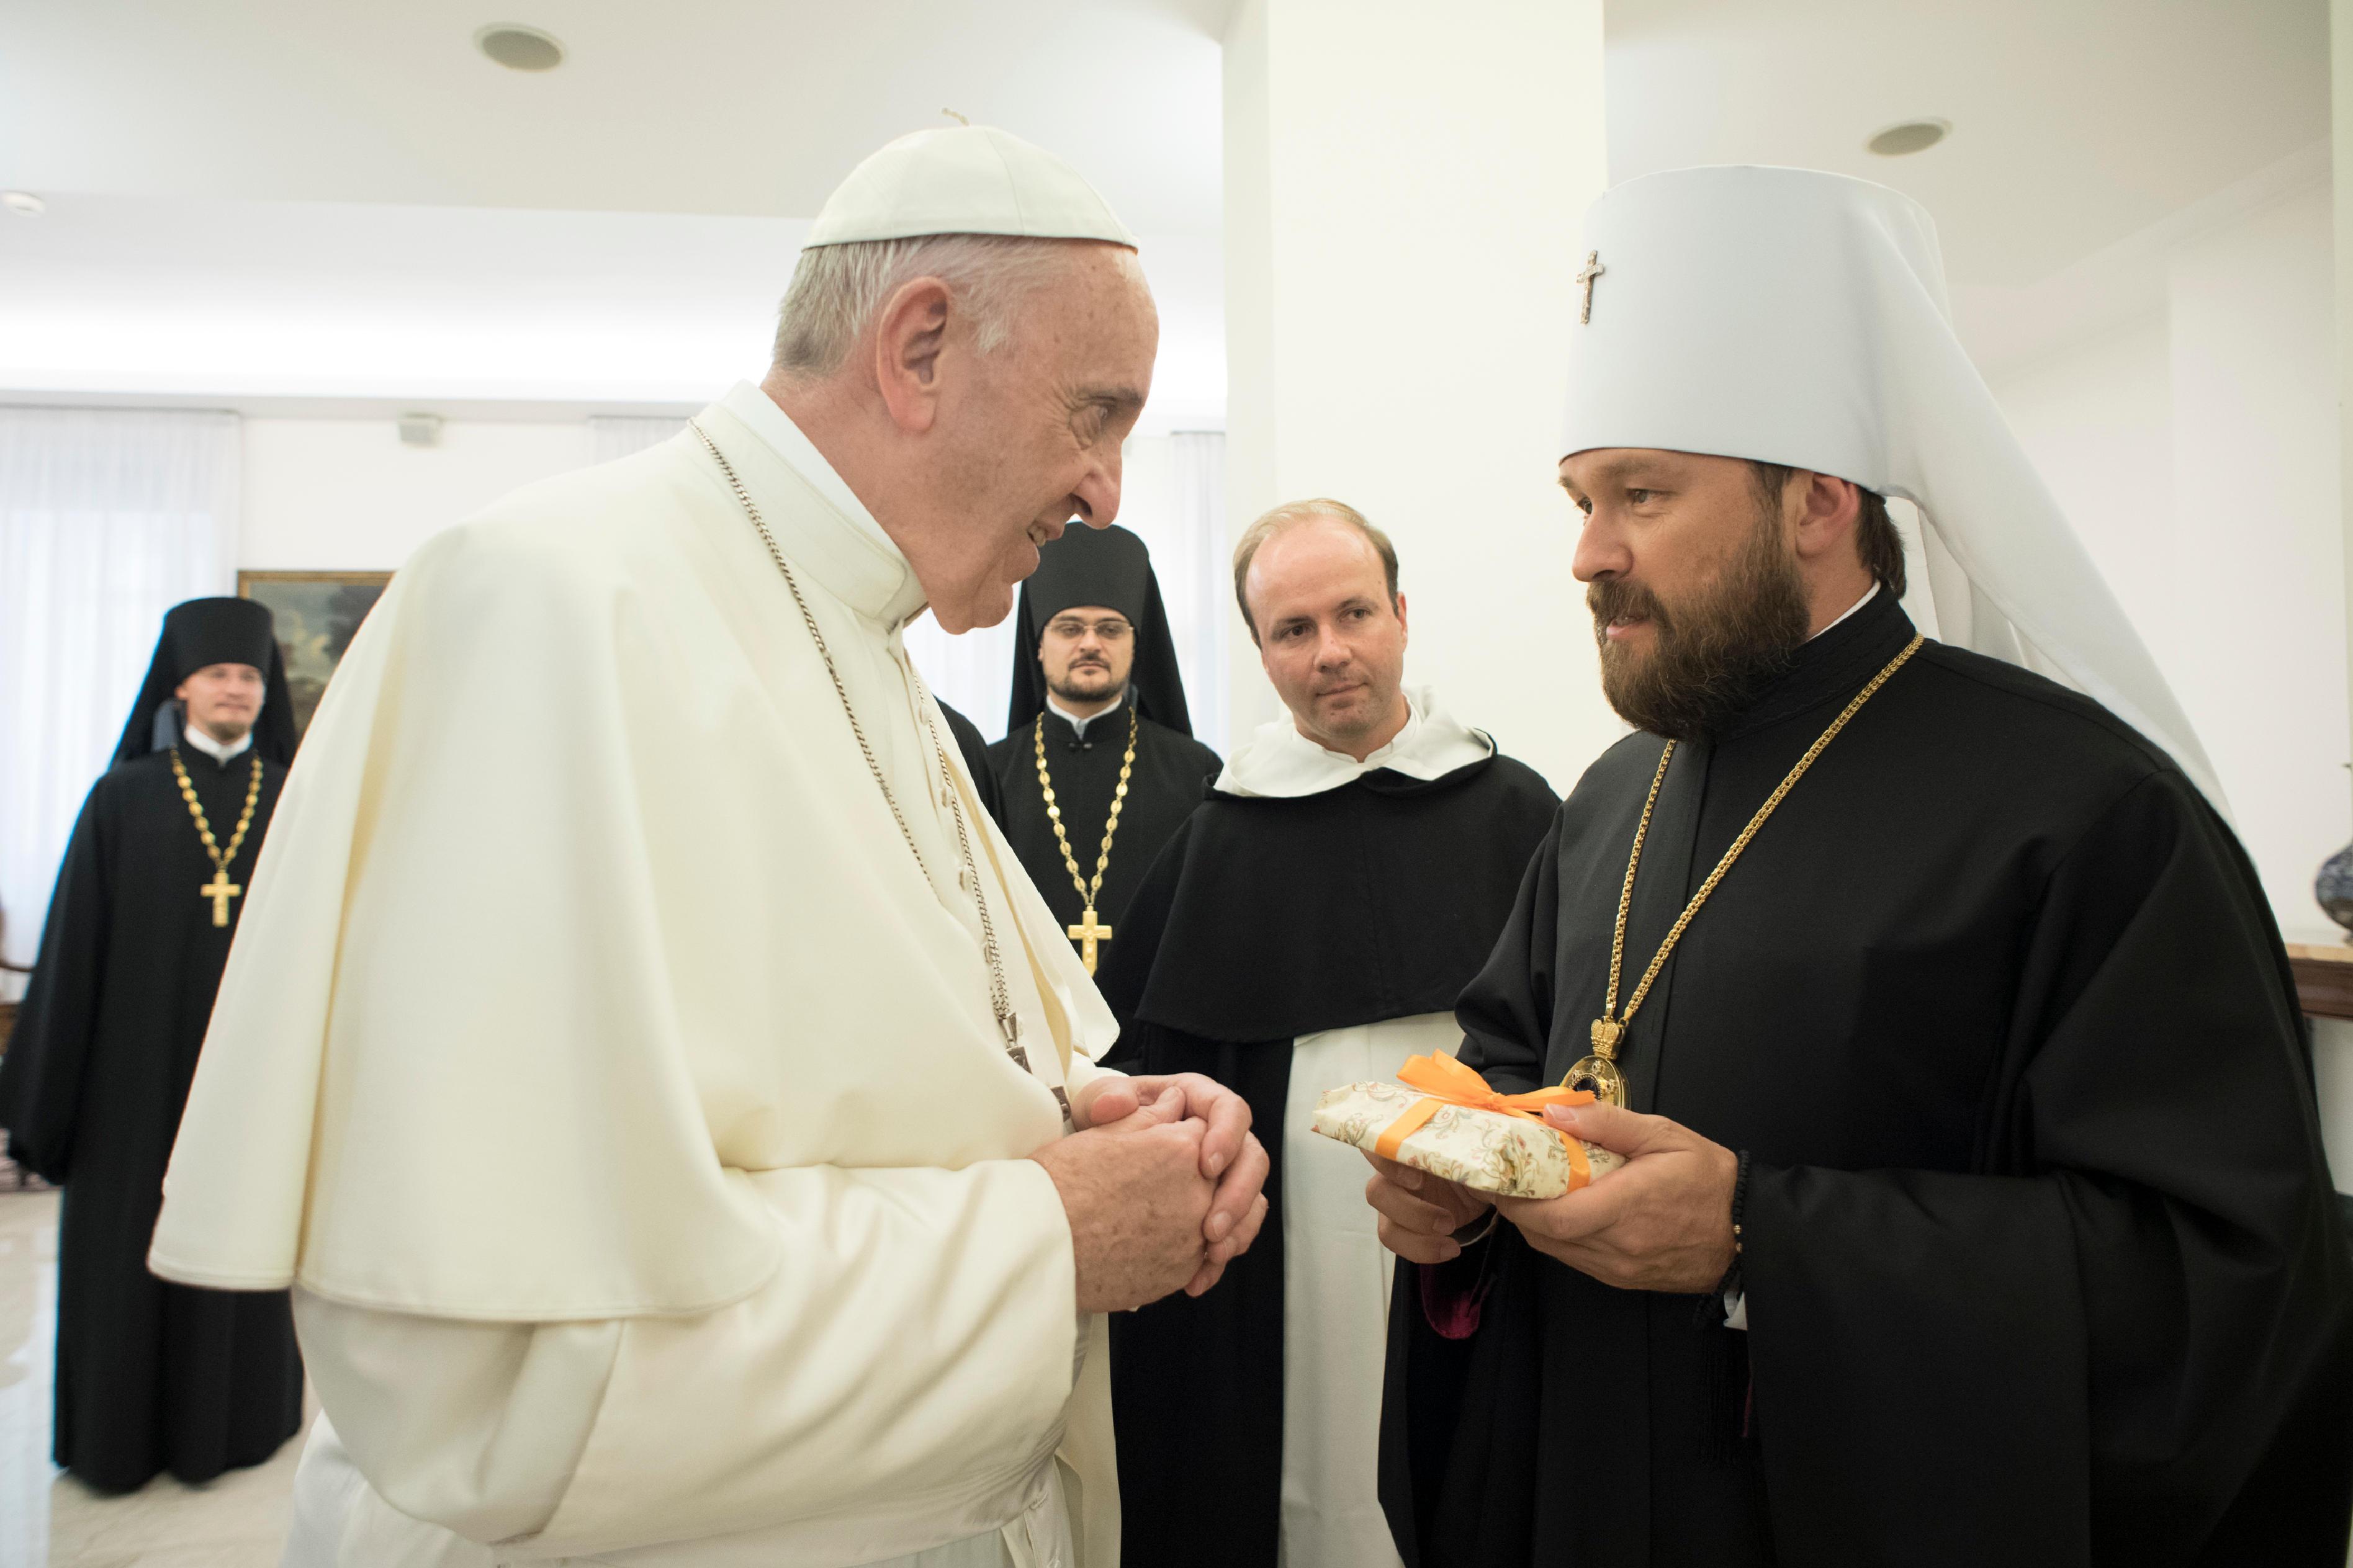 Métropolite Hilarion © L'Osservatore Romano